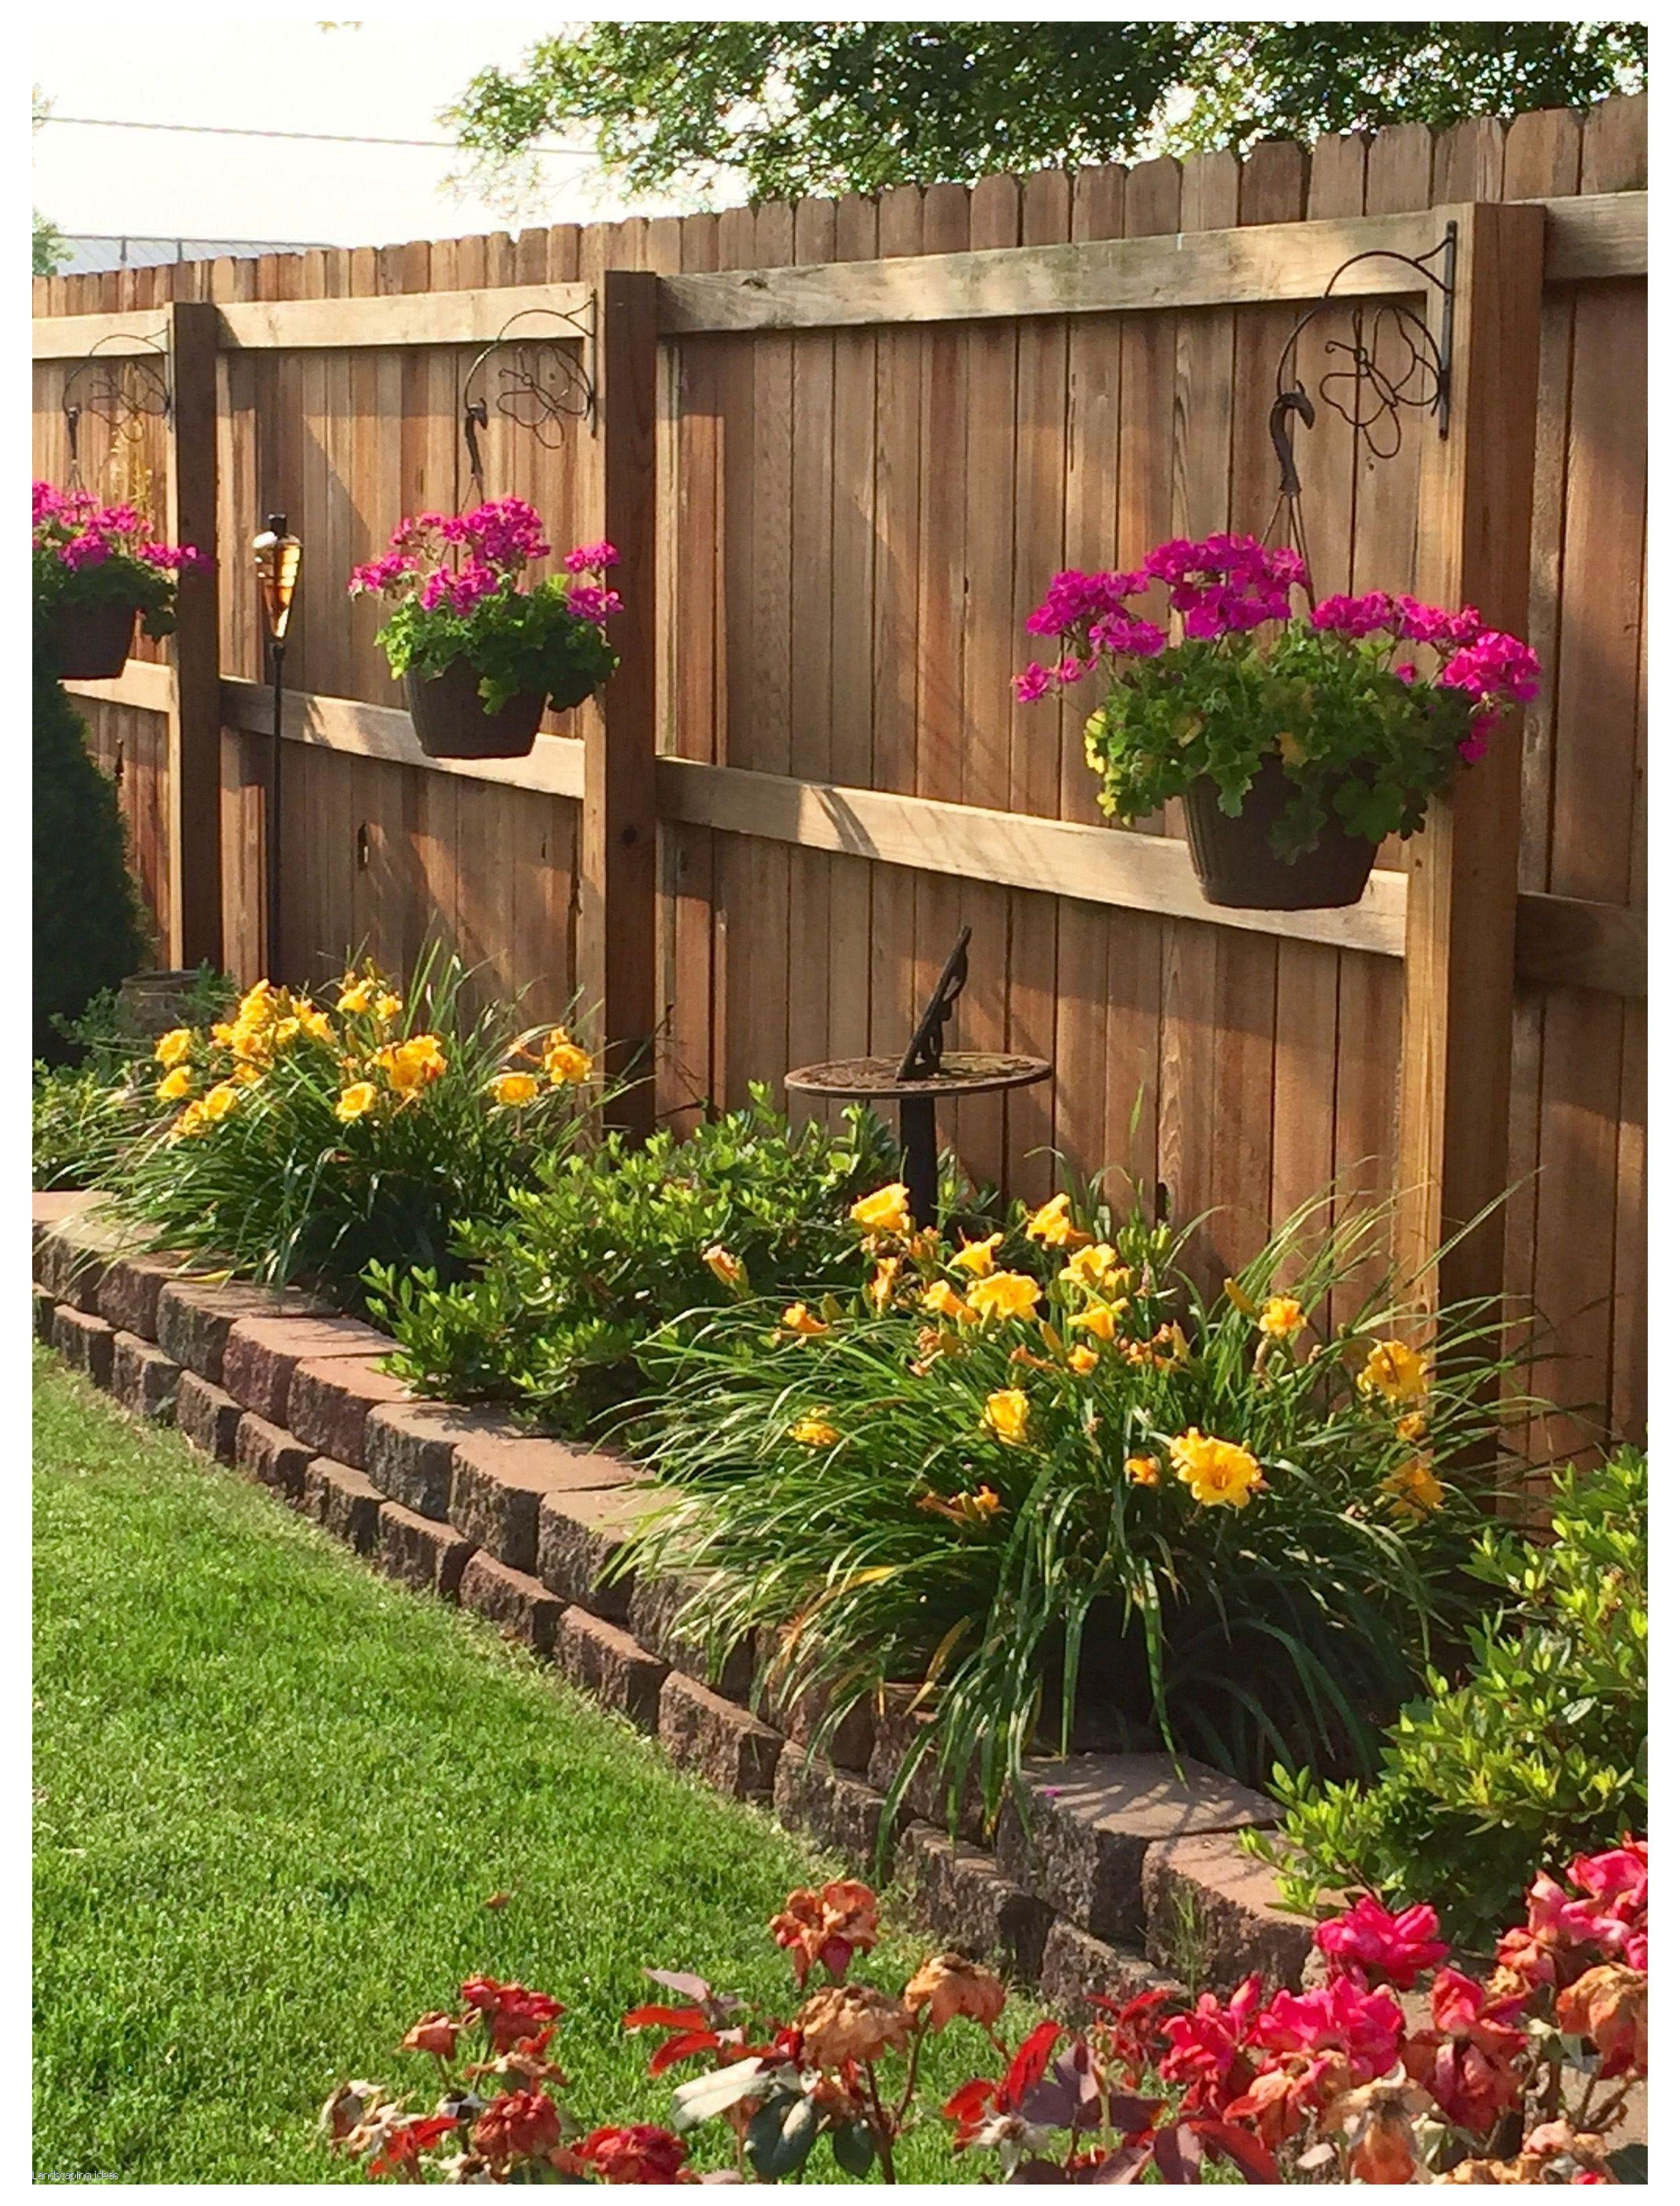 20 Cheap Simple Landscaping Ideas For Your Backyard Small Garden Ideas On A Budget Sim Garden Design Small Backyard Landscaping Small Backyard Gardens Backyard garden ideas for small yards